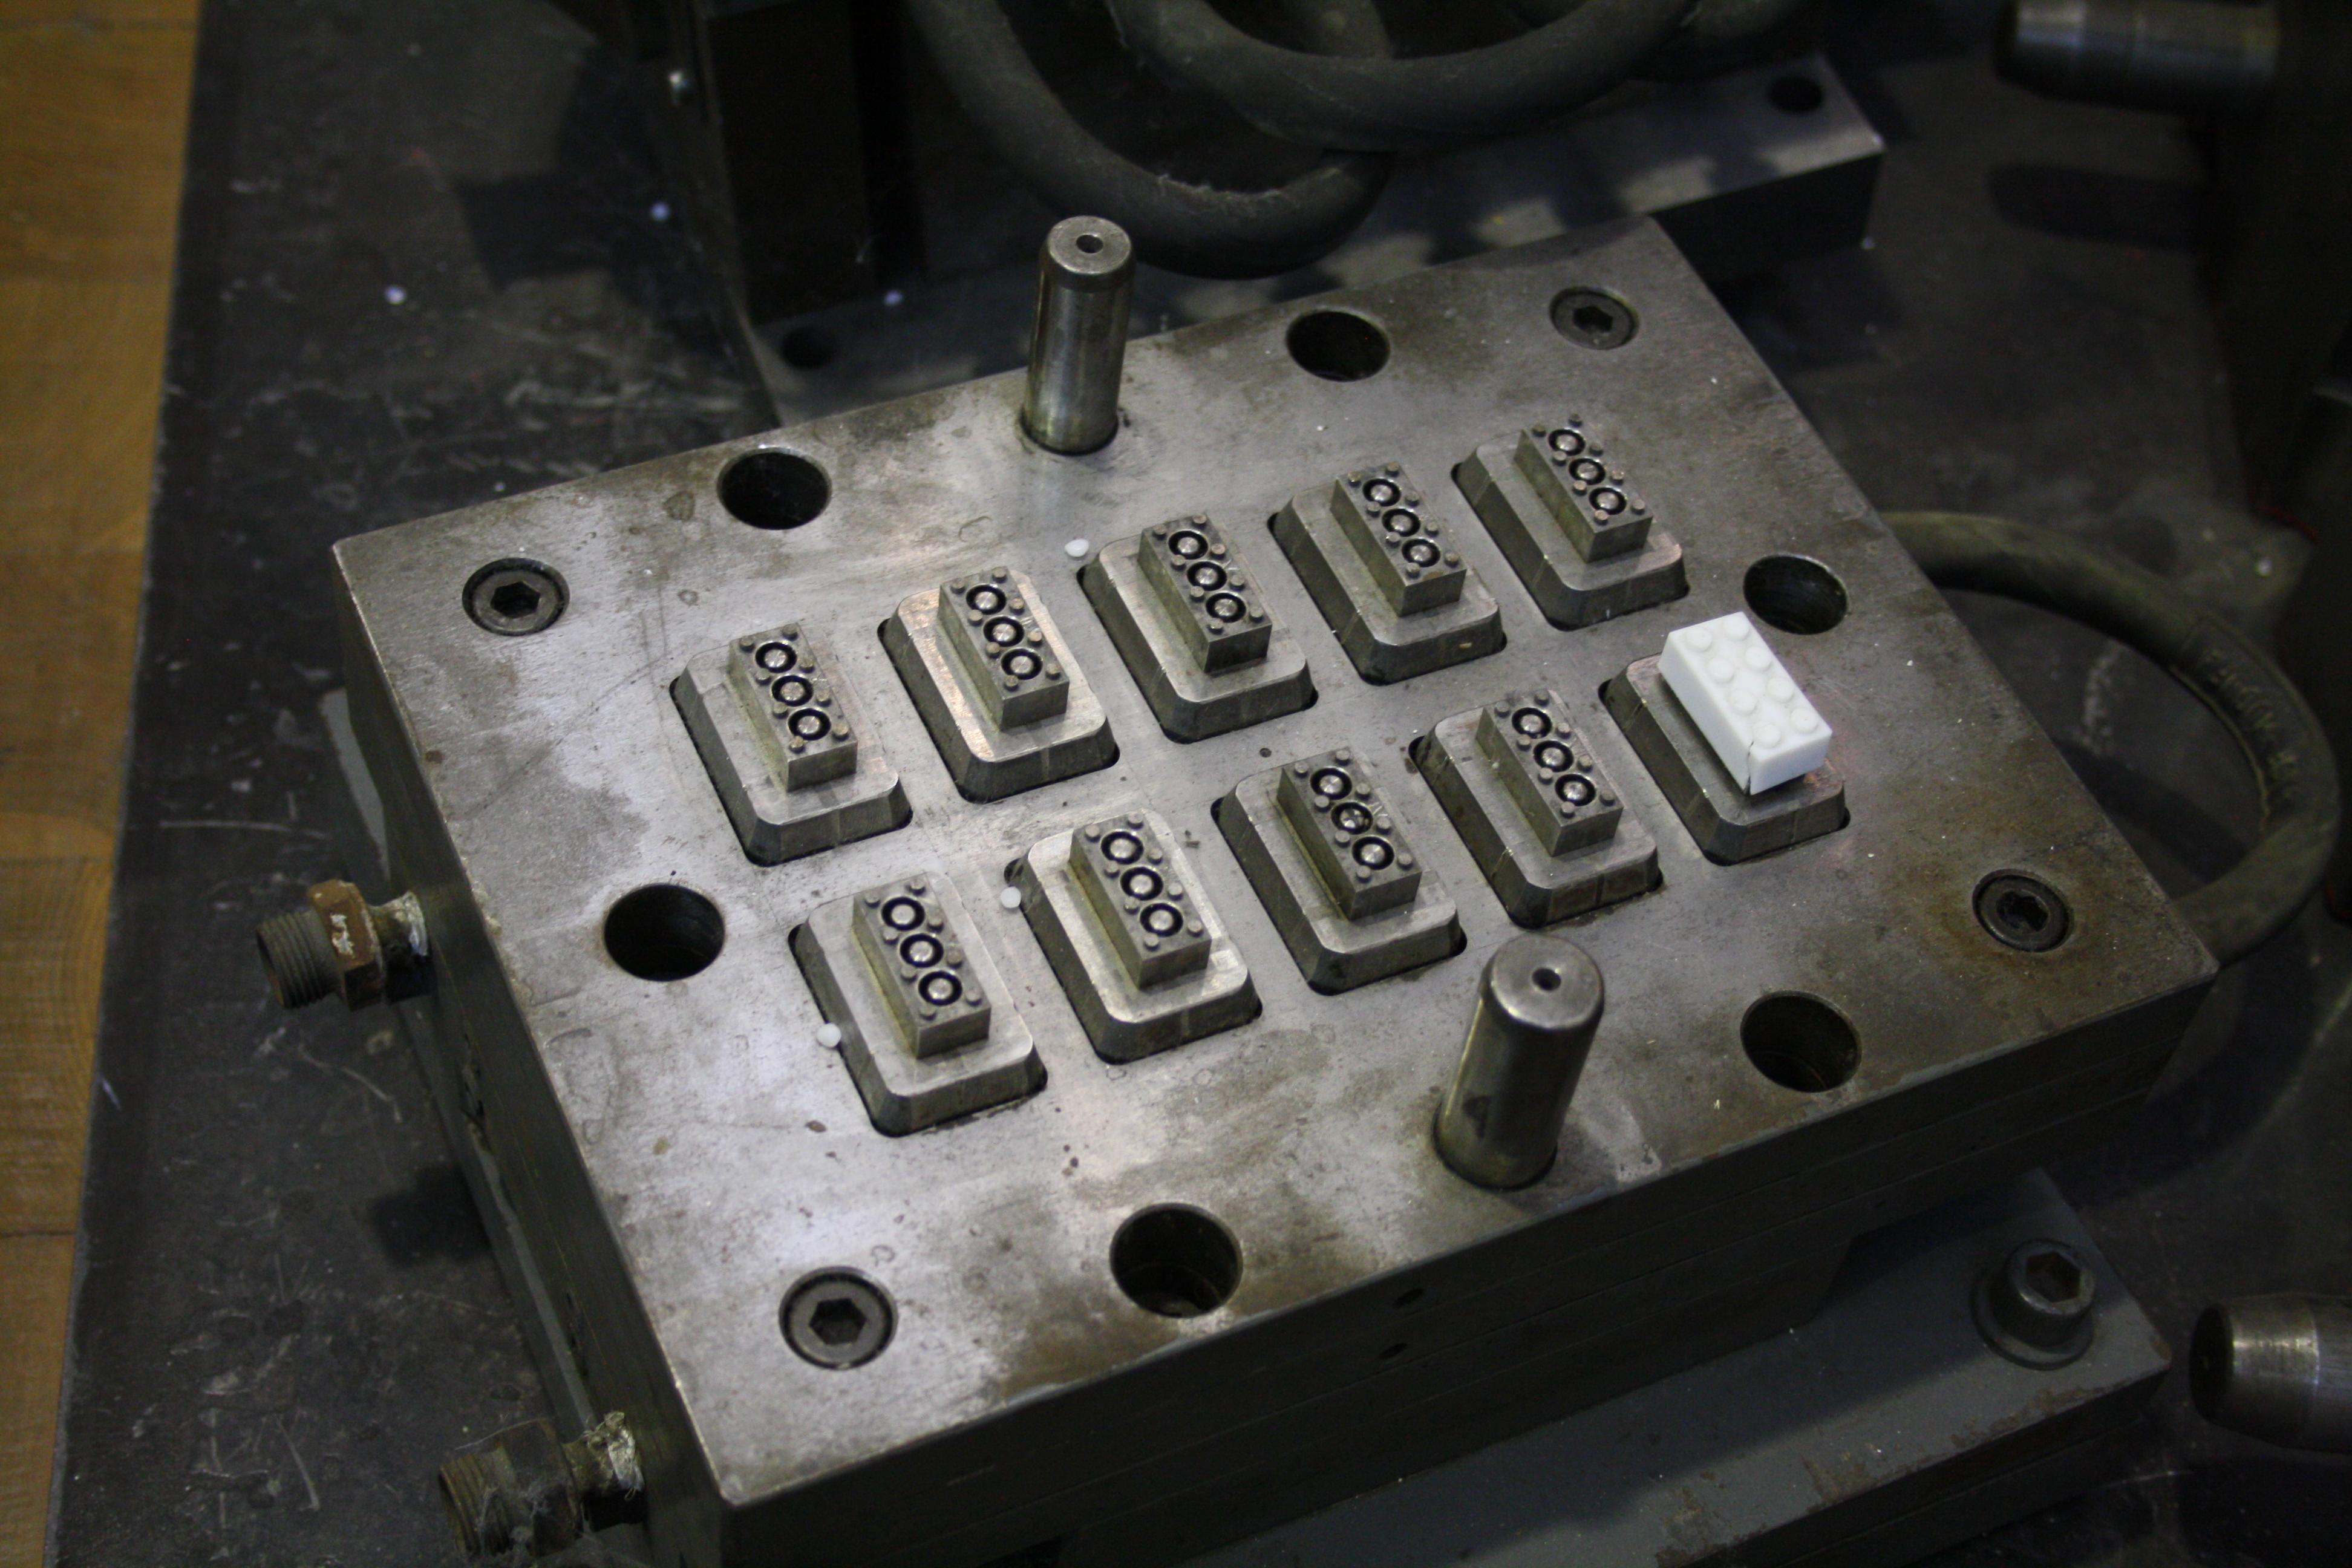 Lego Injection Mold